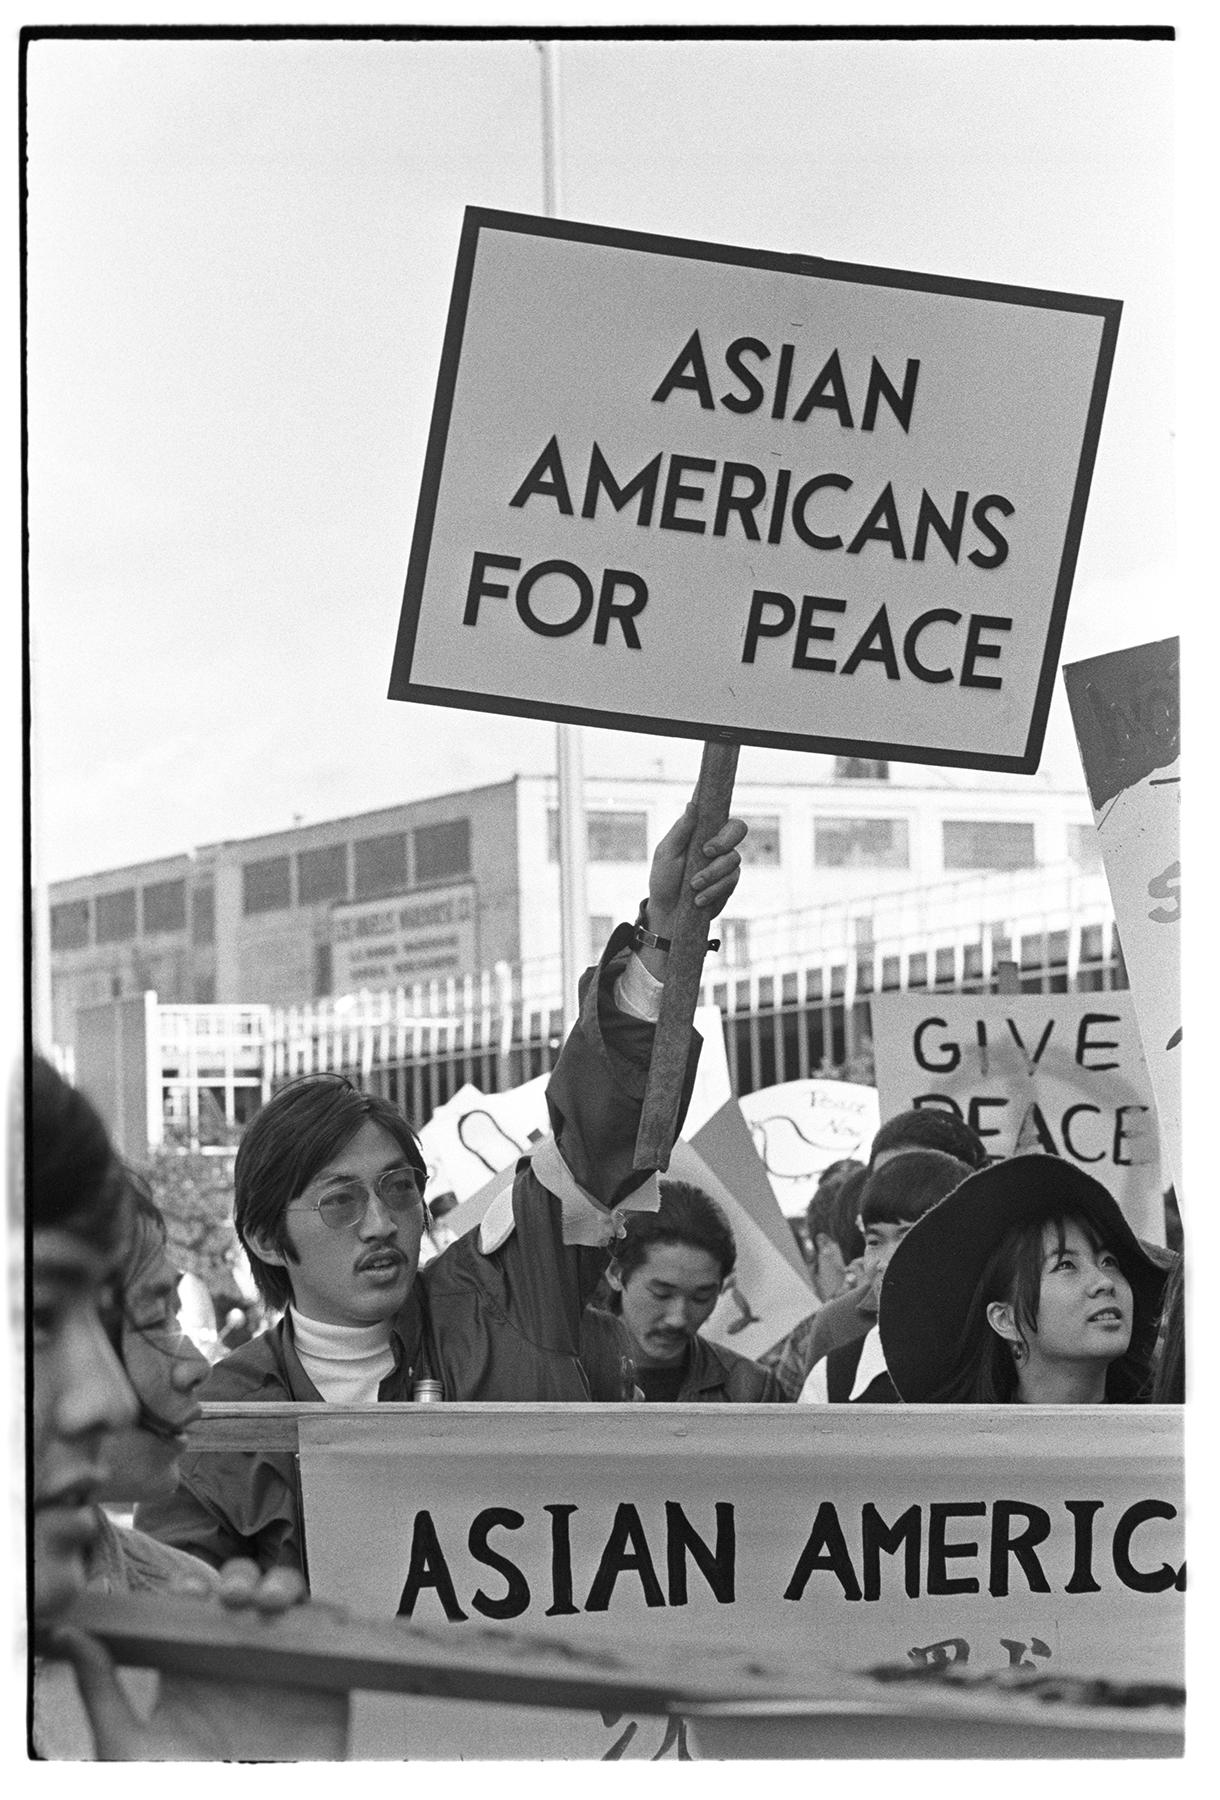 events/JANM-AtFirstLight-VC-AsAmer-AntiVietnamMarch-1972-photoRNakamura.jpg